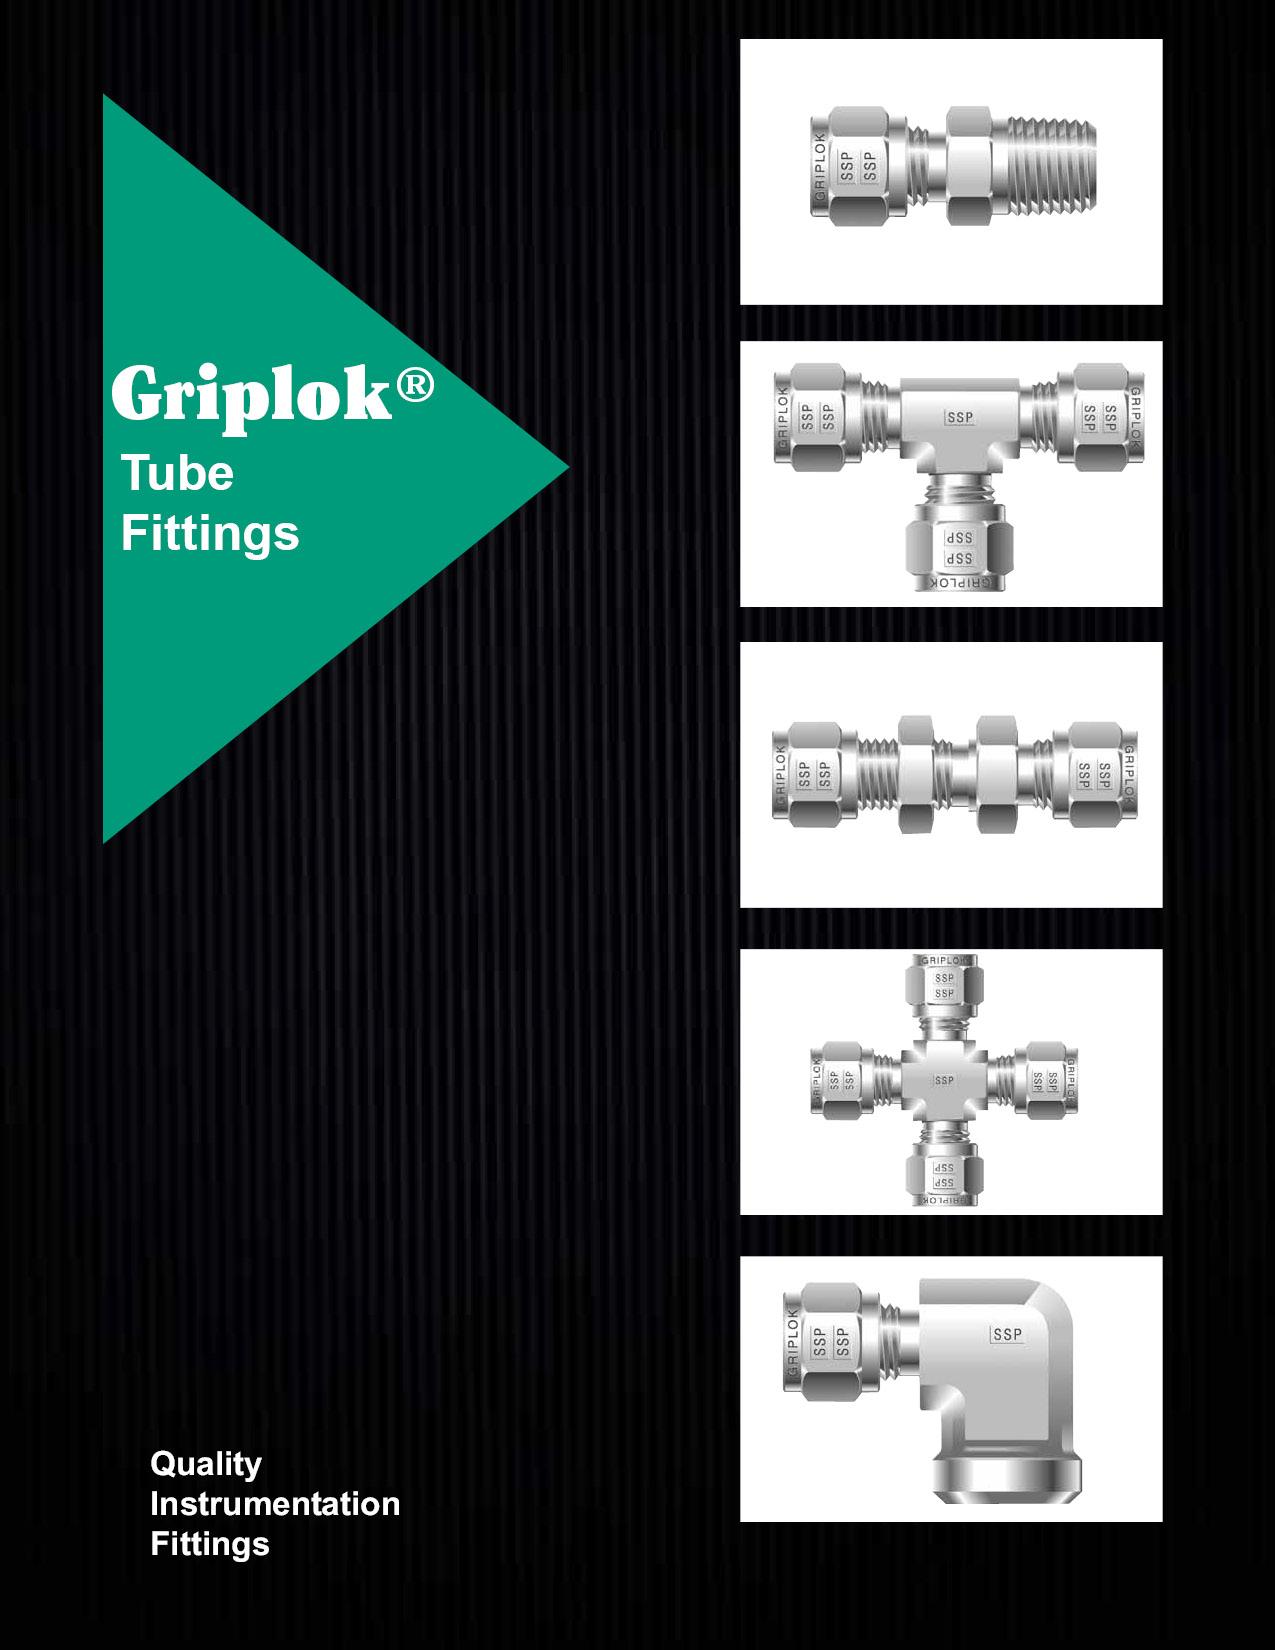 Griplok Catalog Cover Image